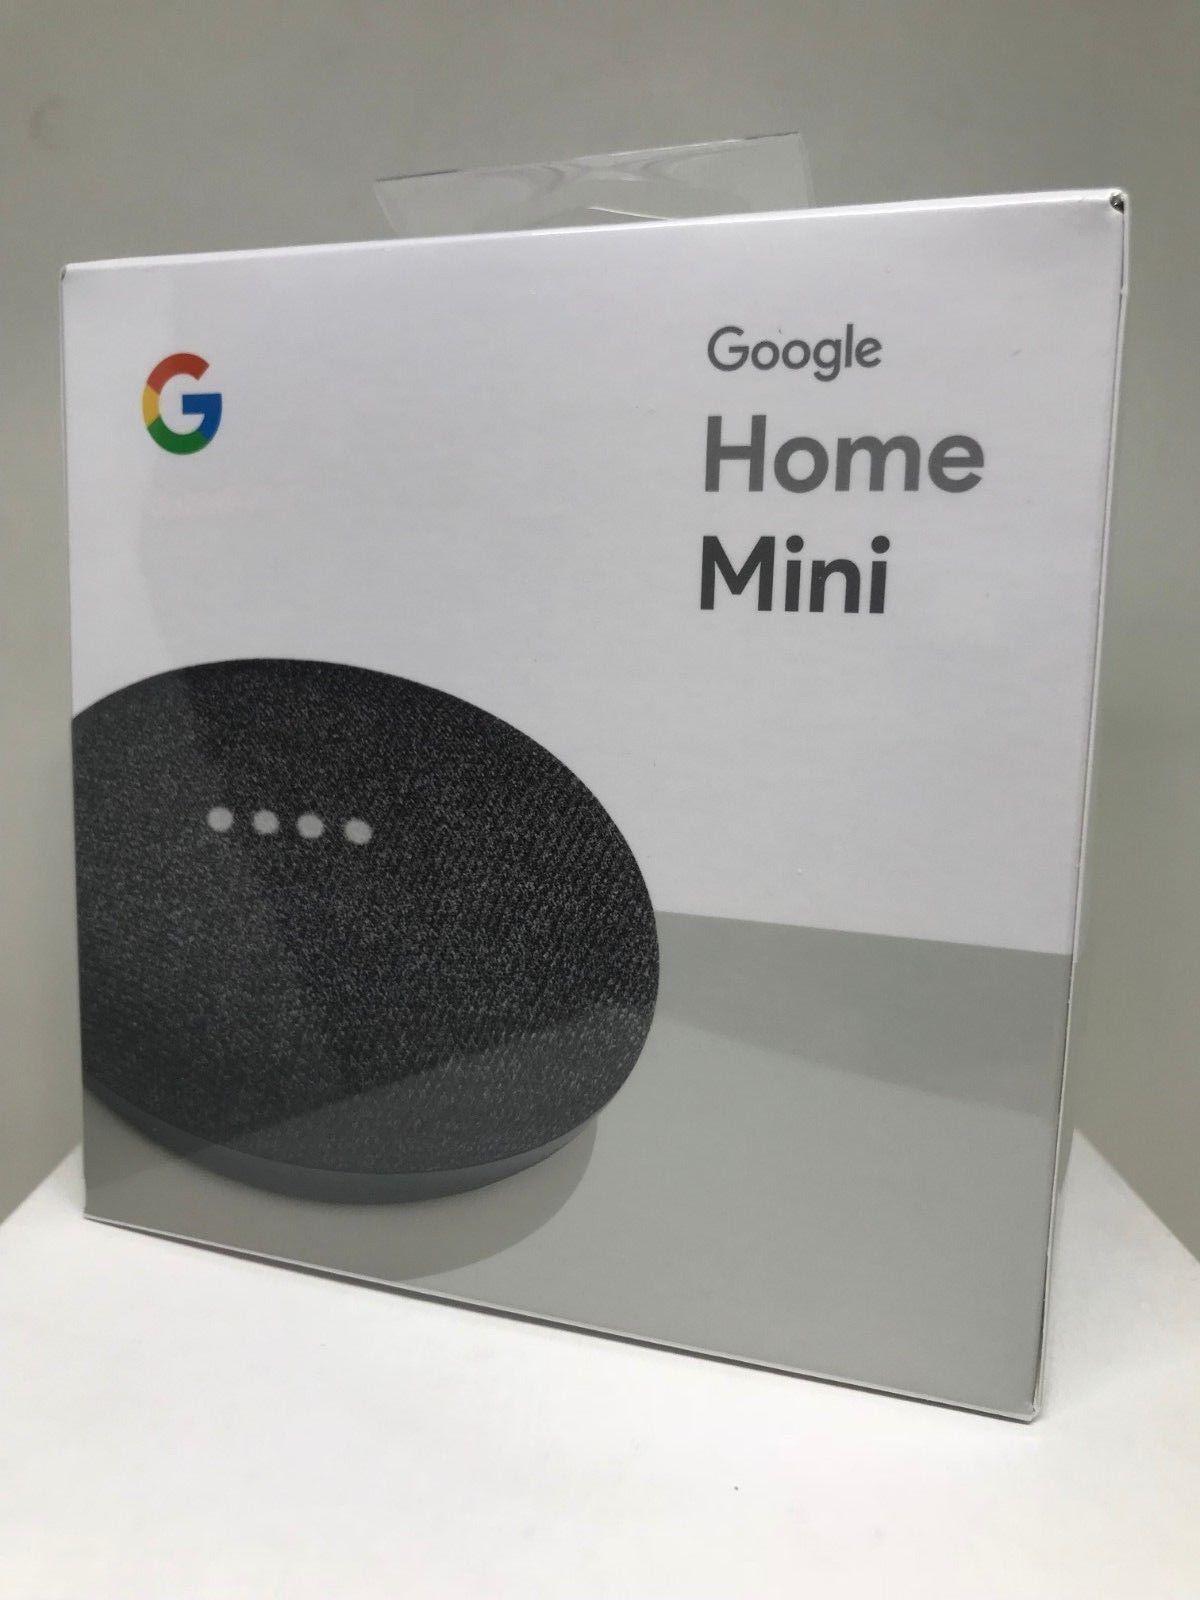 Google Home Mini - Smart Small Speaker - Charcoal - BRAND NEW